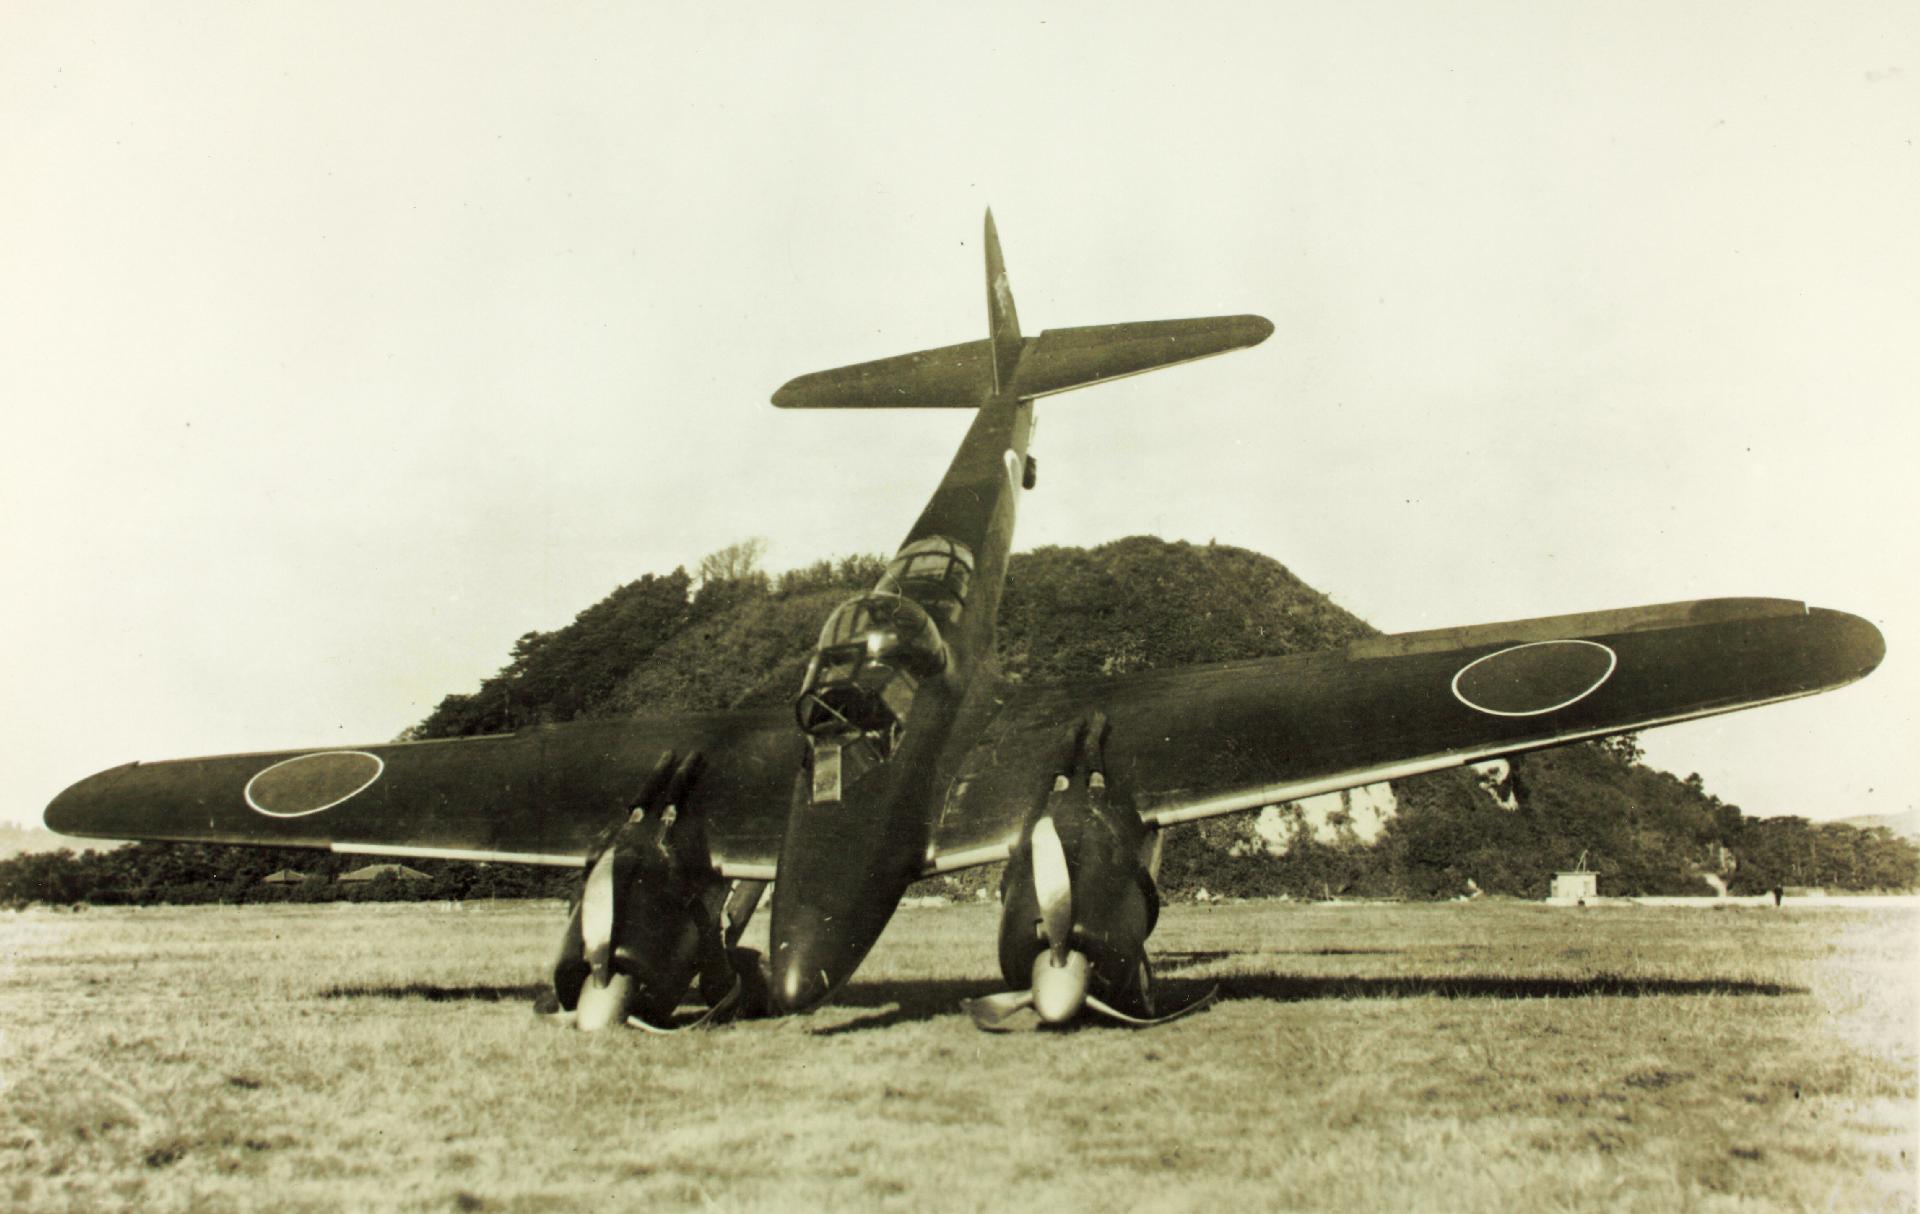 https://upload.wikimedia.org/wikipedia/commons/1/15/Wrecked_Nakajima_J1N1-R_Gekko_on_airfield_1945.jpg